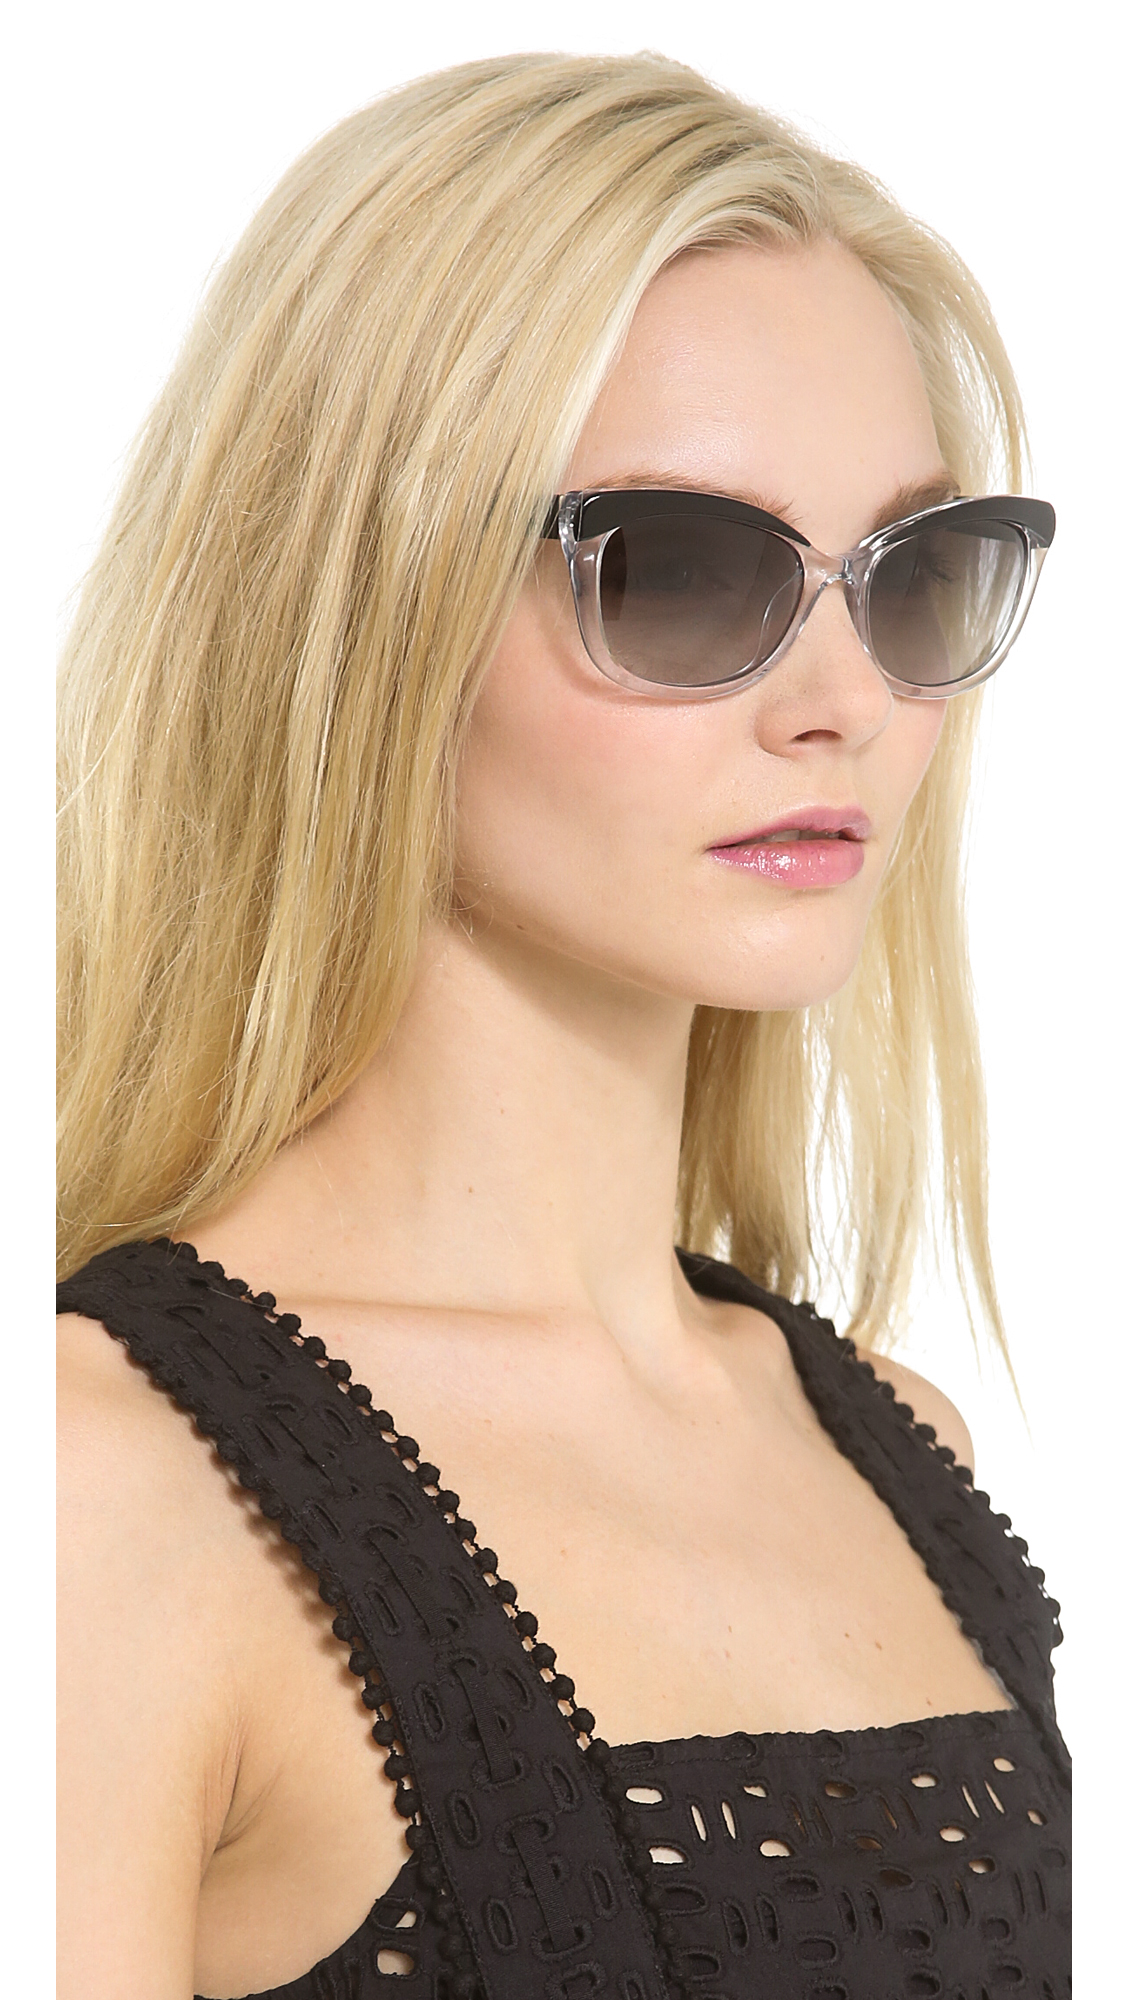 cfdc2a43e44b Kate Spade New York Amara Sunglasses | SHOPBOP